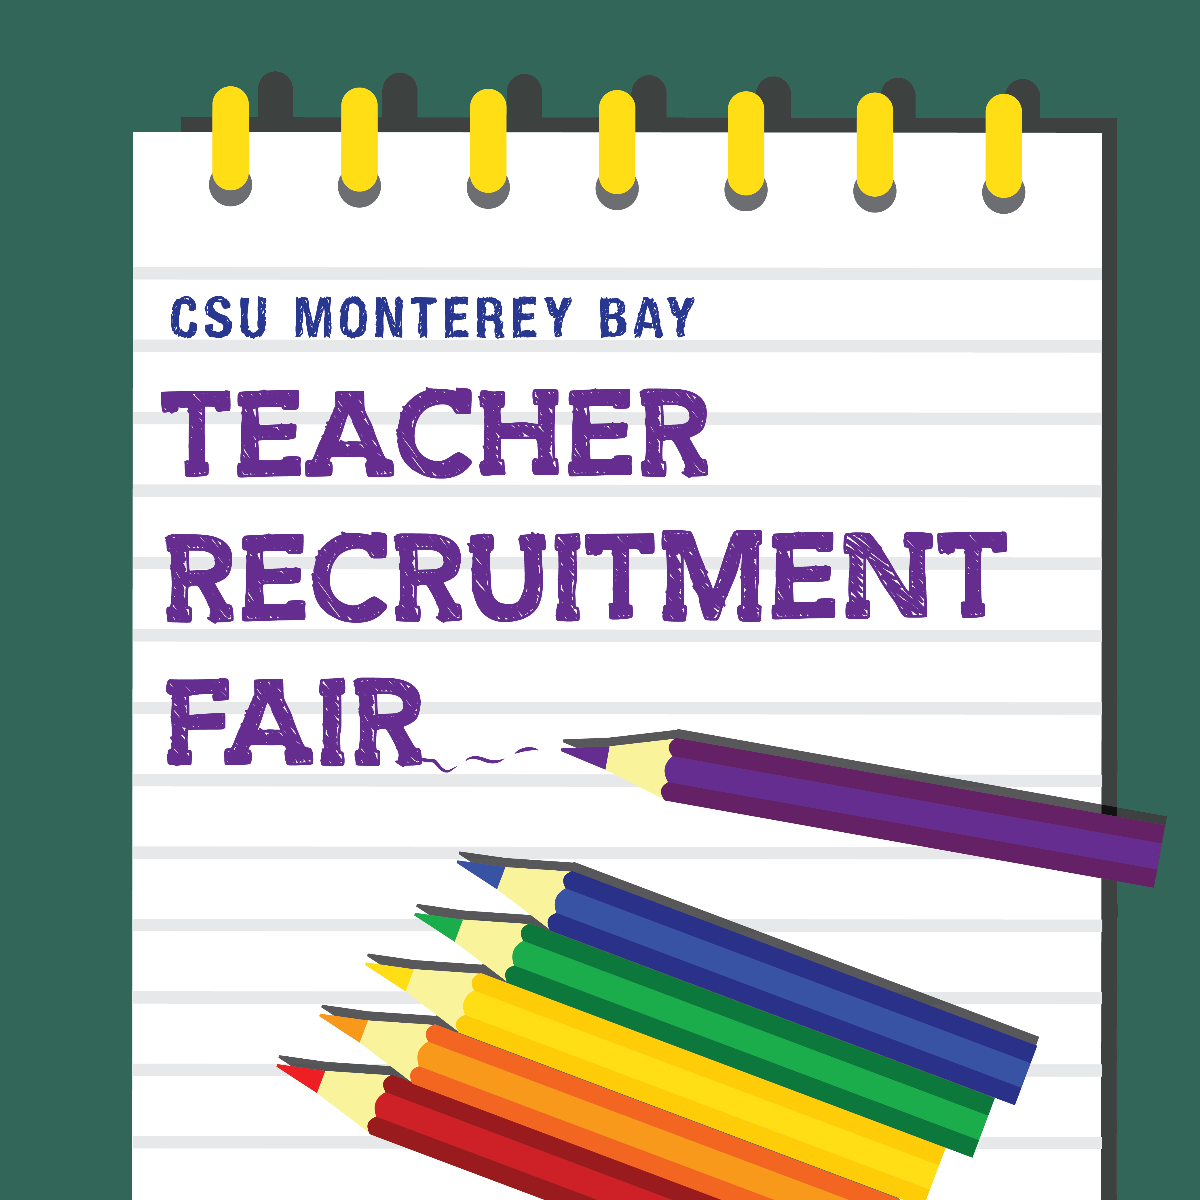 Event image for Teachers Recruitment Fair.